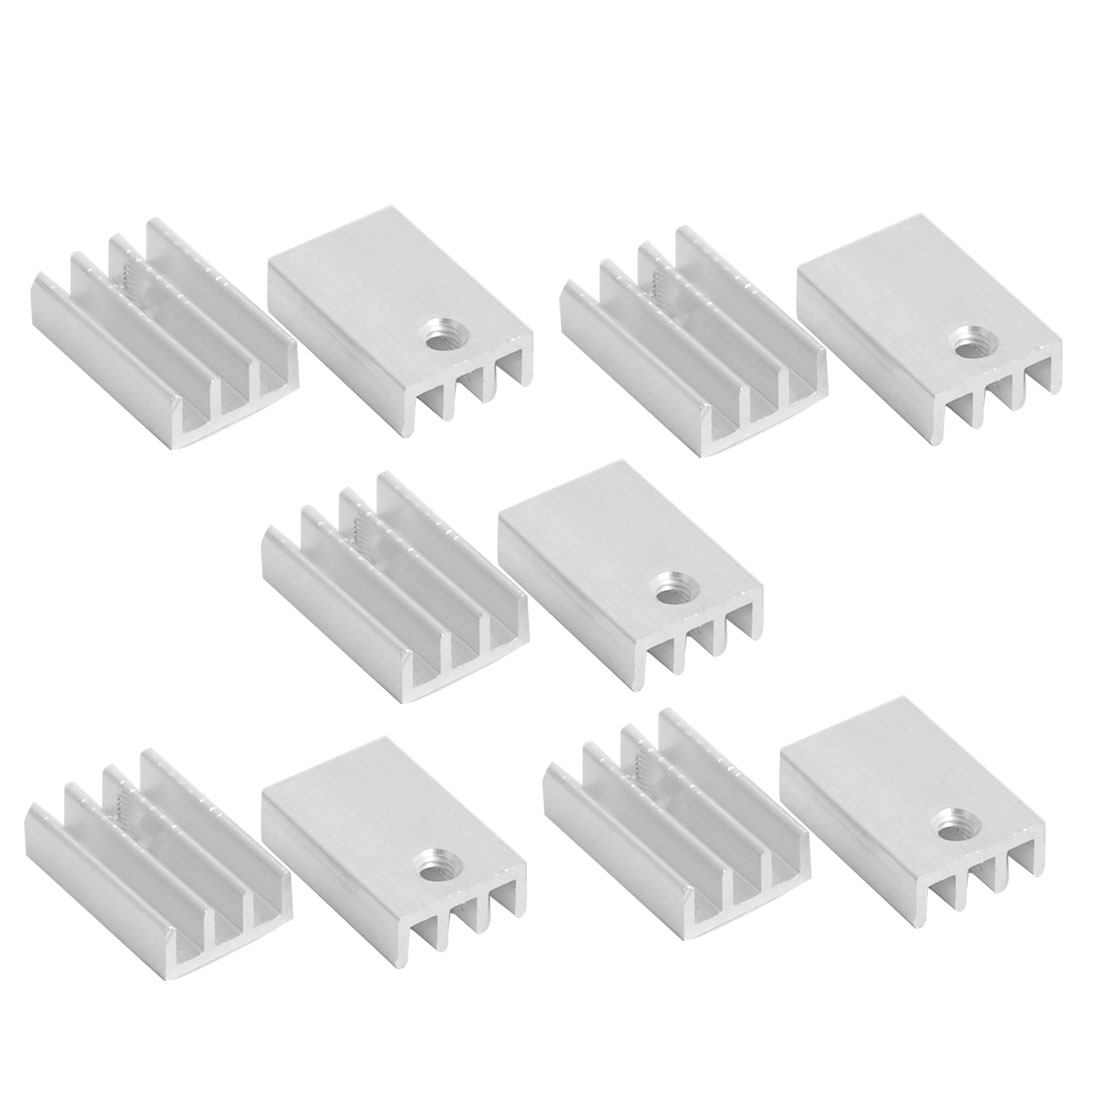 Aluminium Heatsink Cooling Fin Cooler Silver Tone 17mm x 11mm x 5mm 10 Pcs